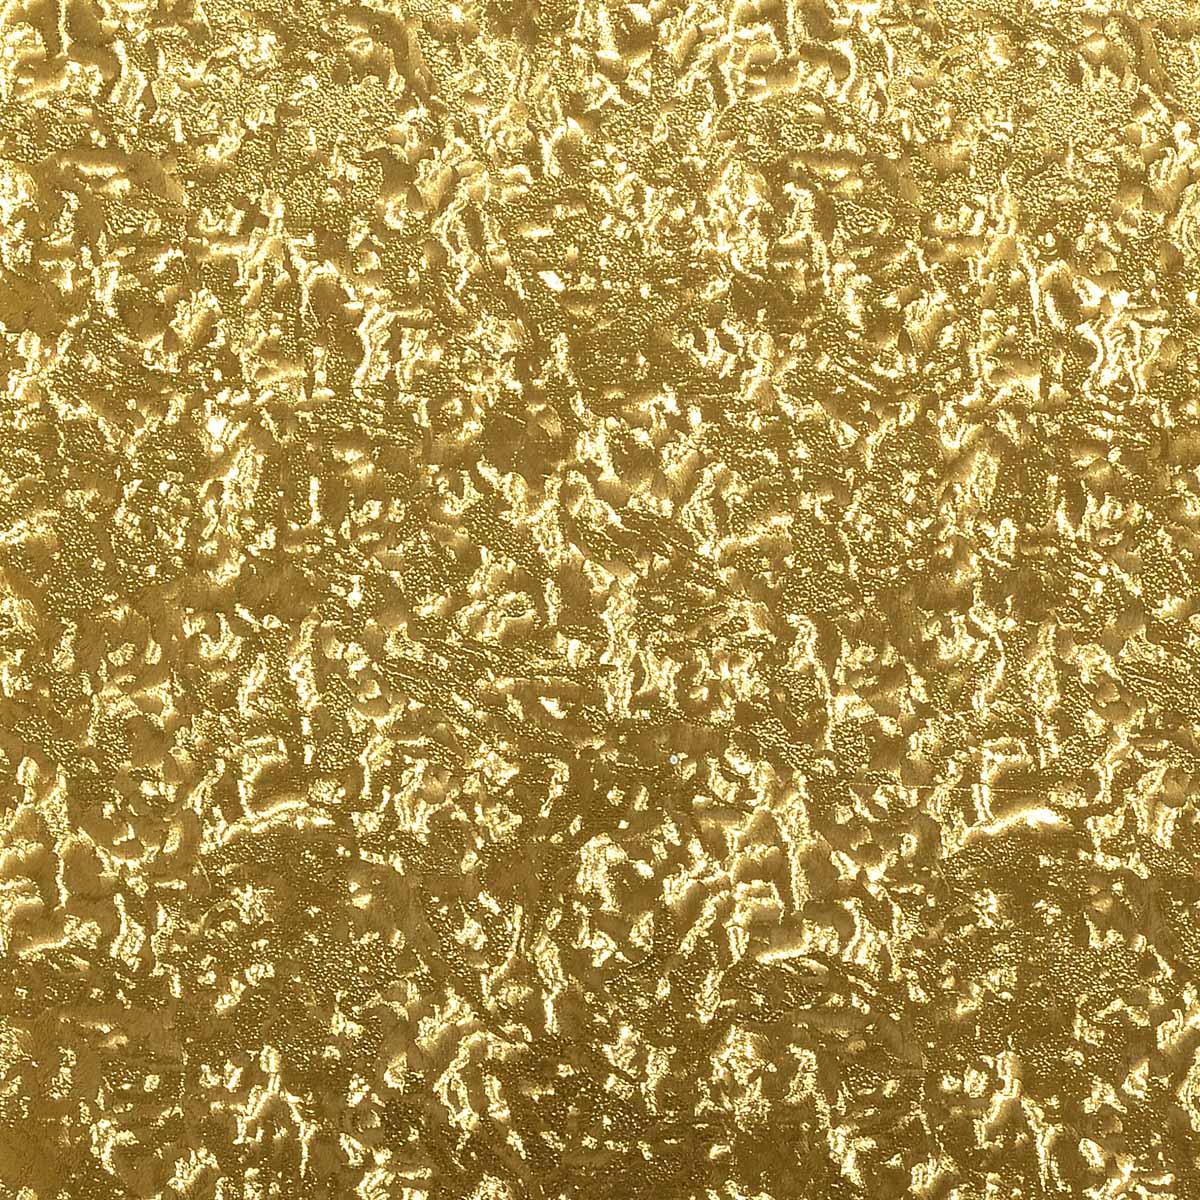 Metallic Gold Foil Background Gold Foil Wallpa...